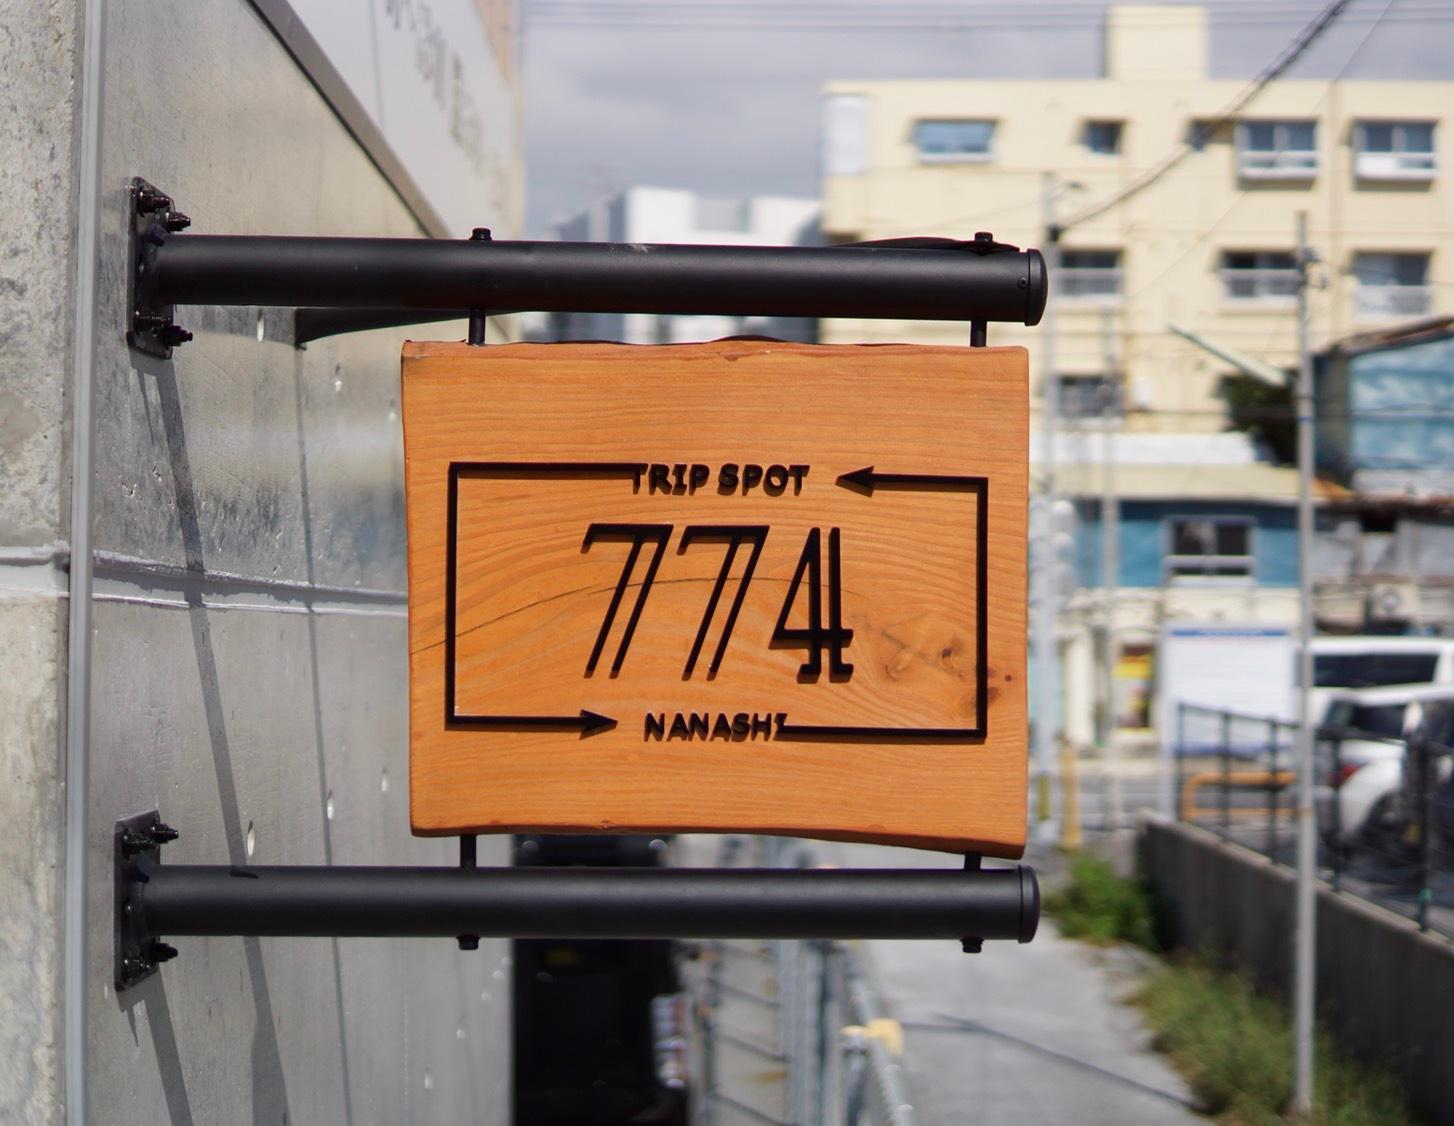 TRIP SPOT 774